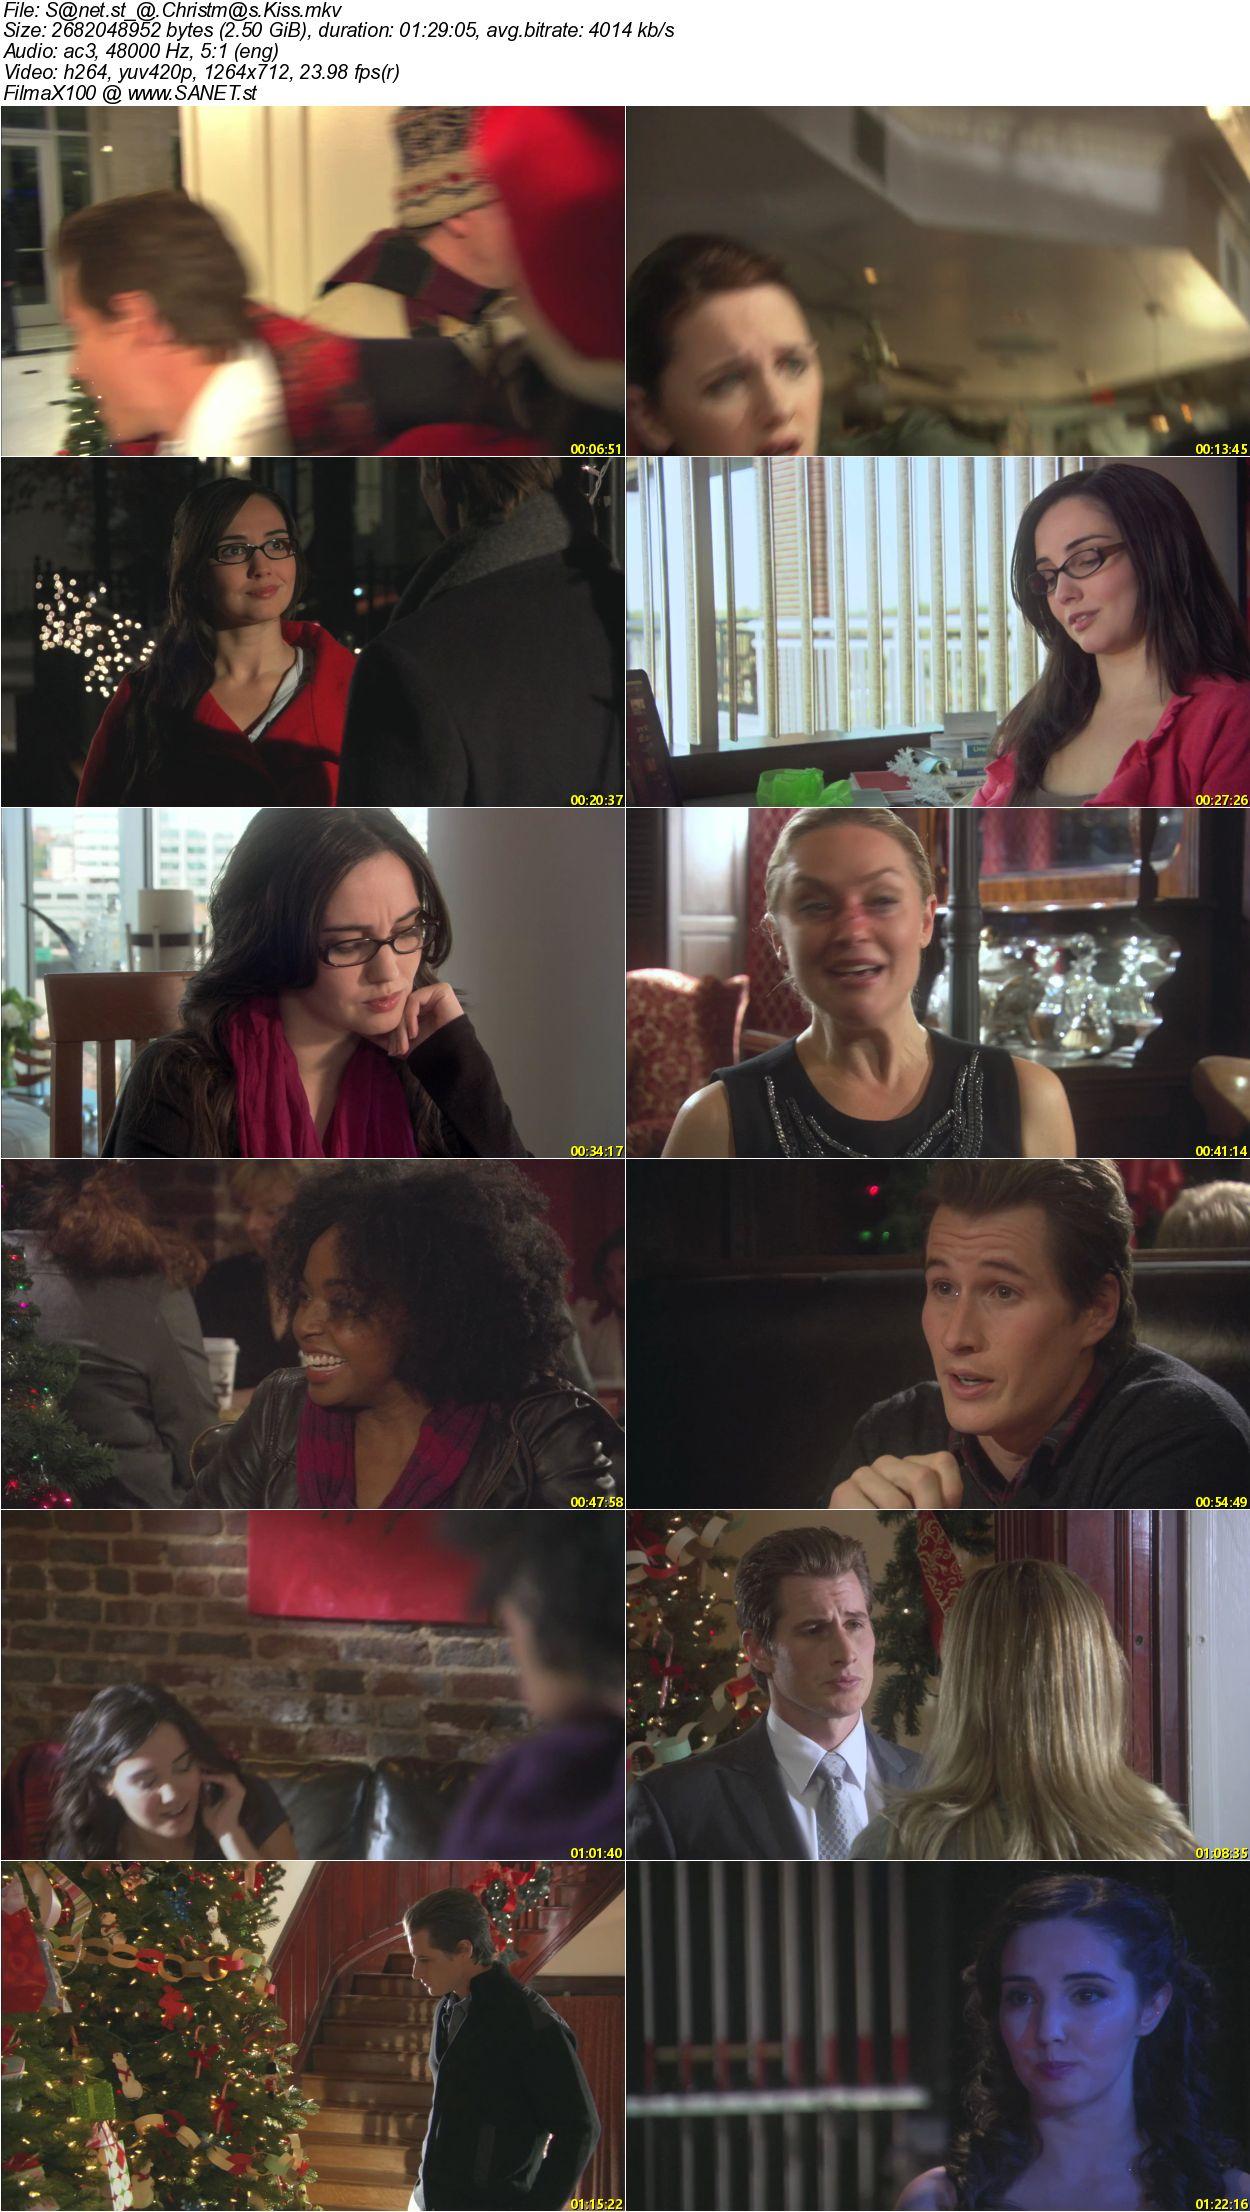 A Christmas Kiss.Download A Christmas Kiss 2011 720p Brrip X264 Ac3 Diversity